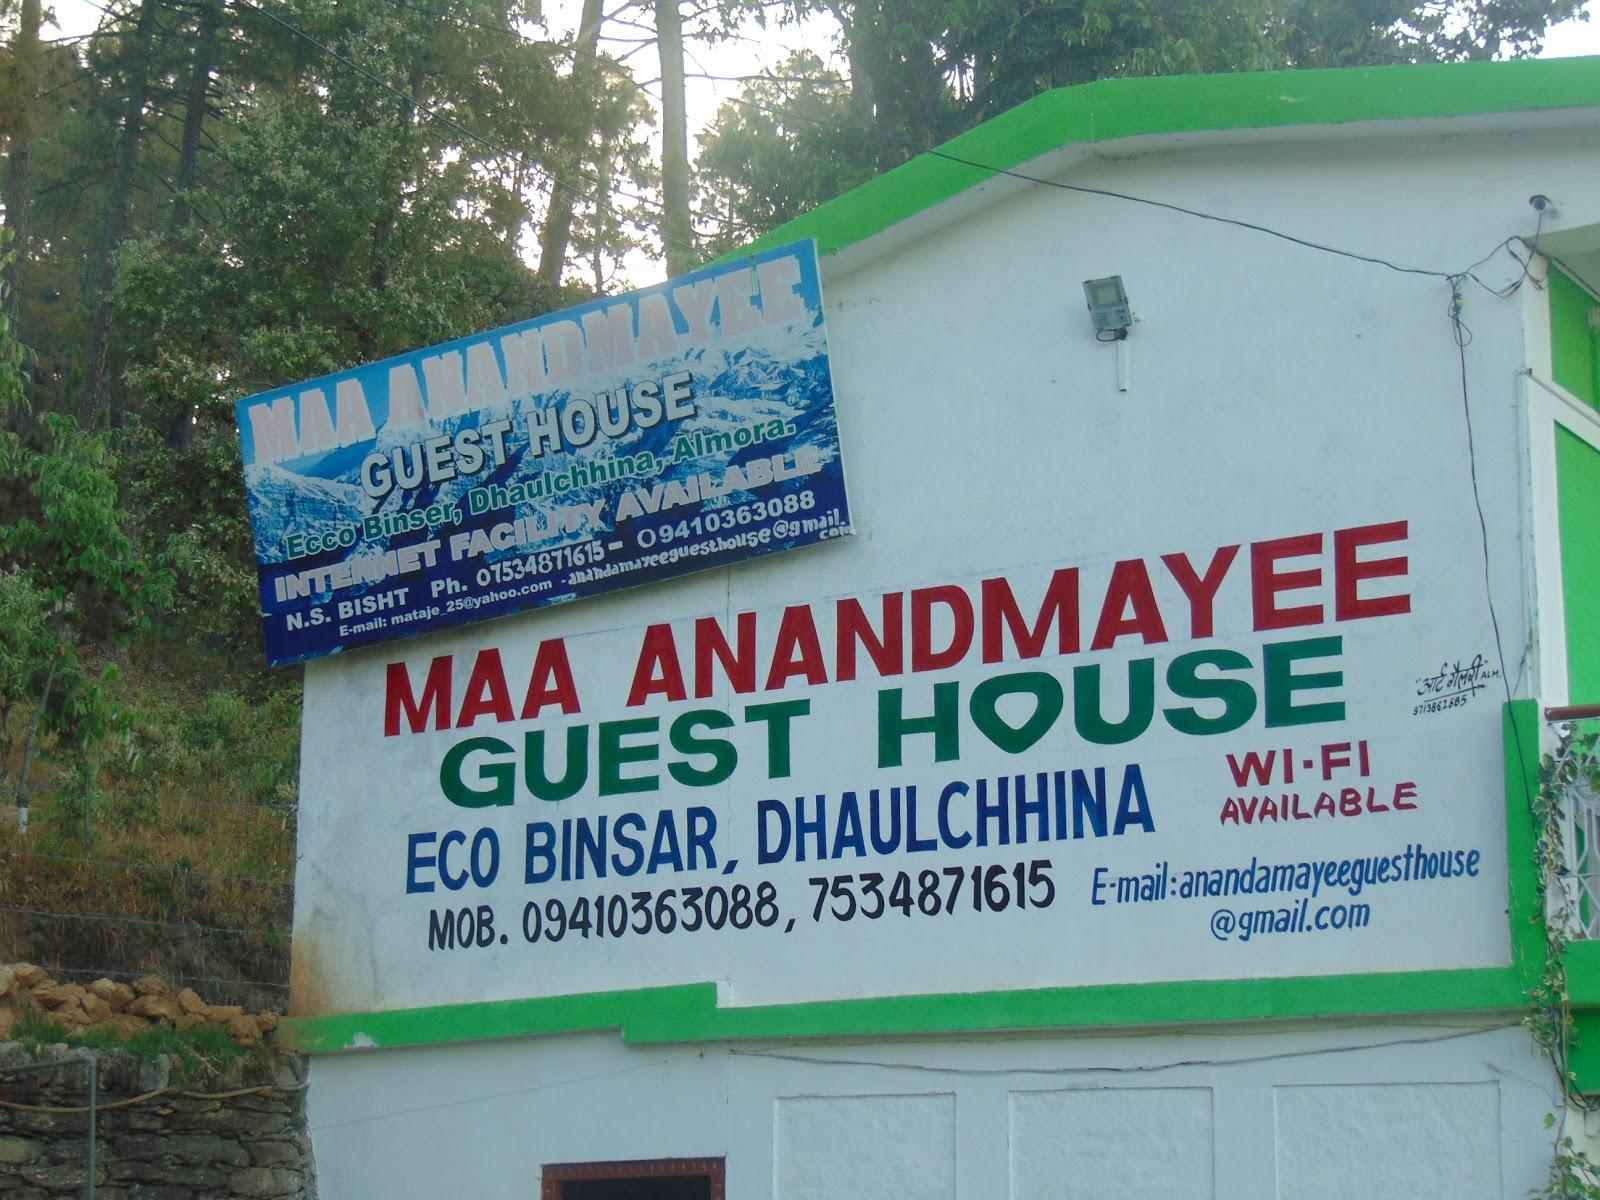 Maa Anandmayee Guest House, Eco Binsar, Dhaulachinna - A few sights